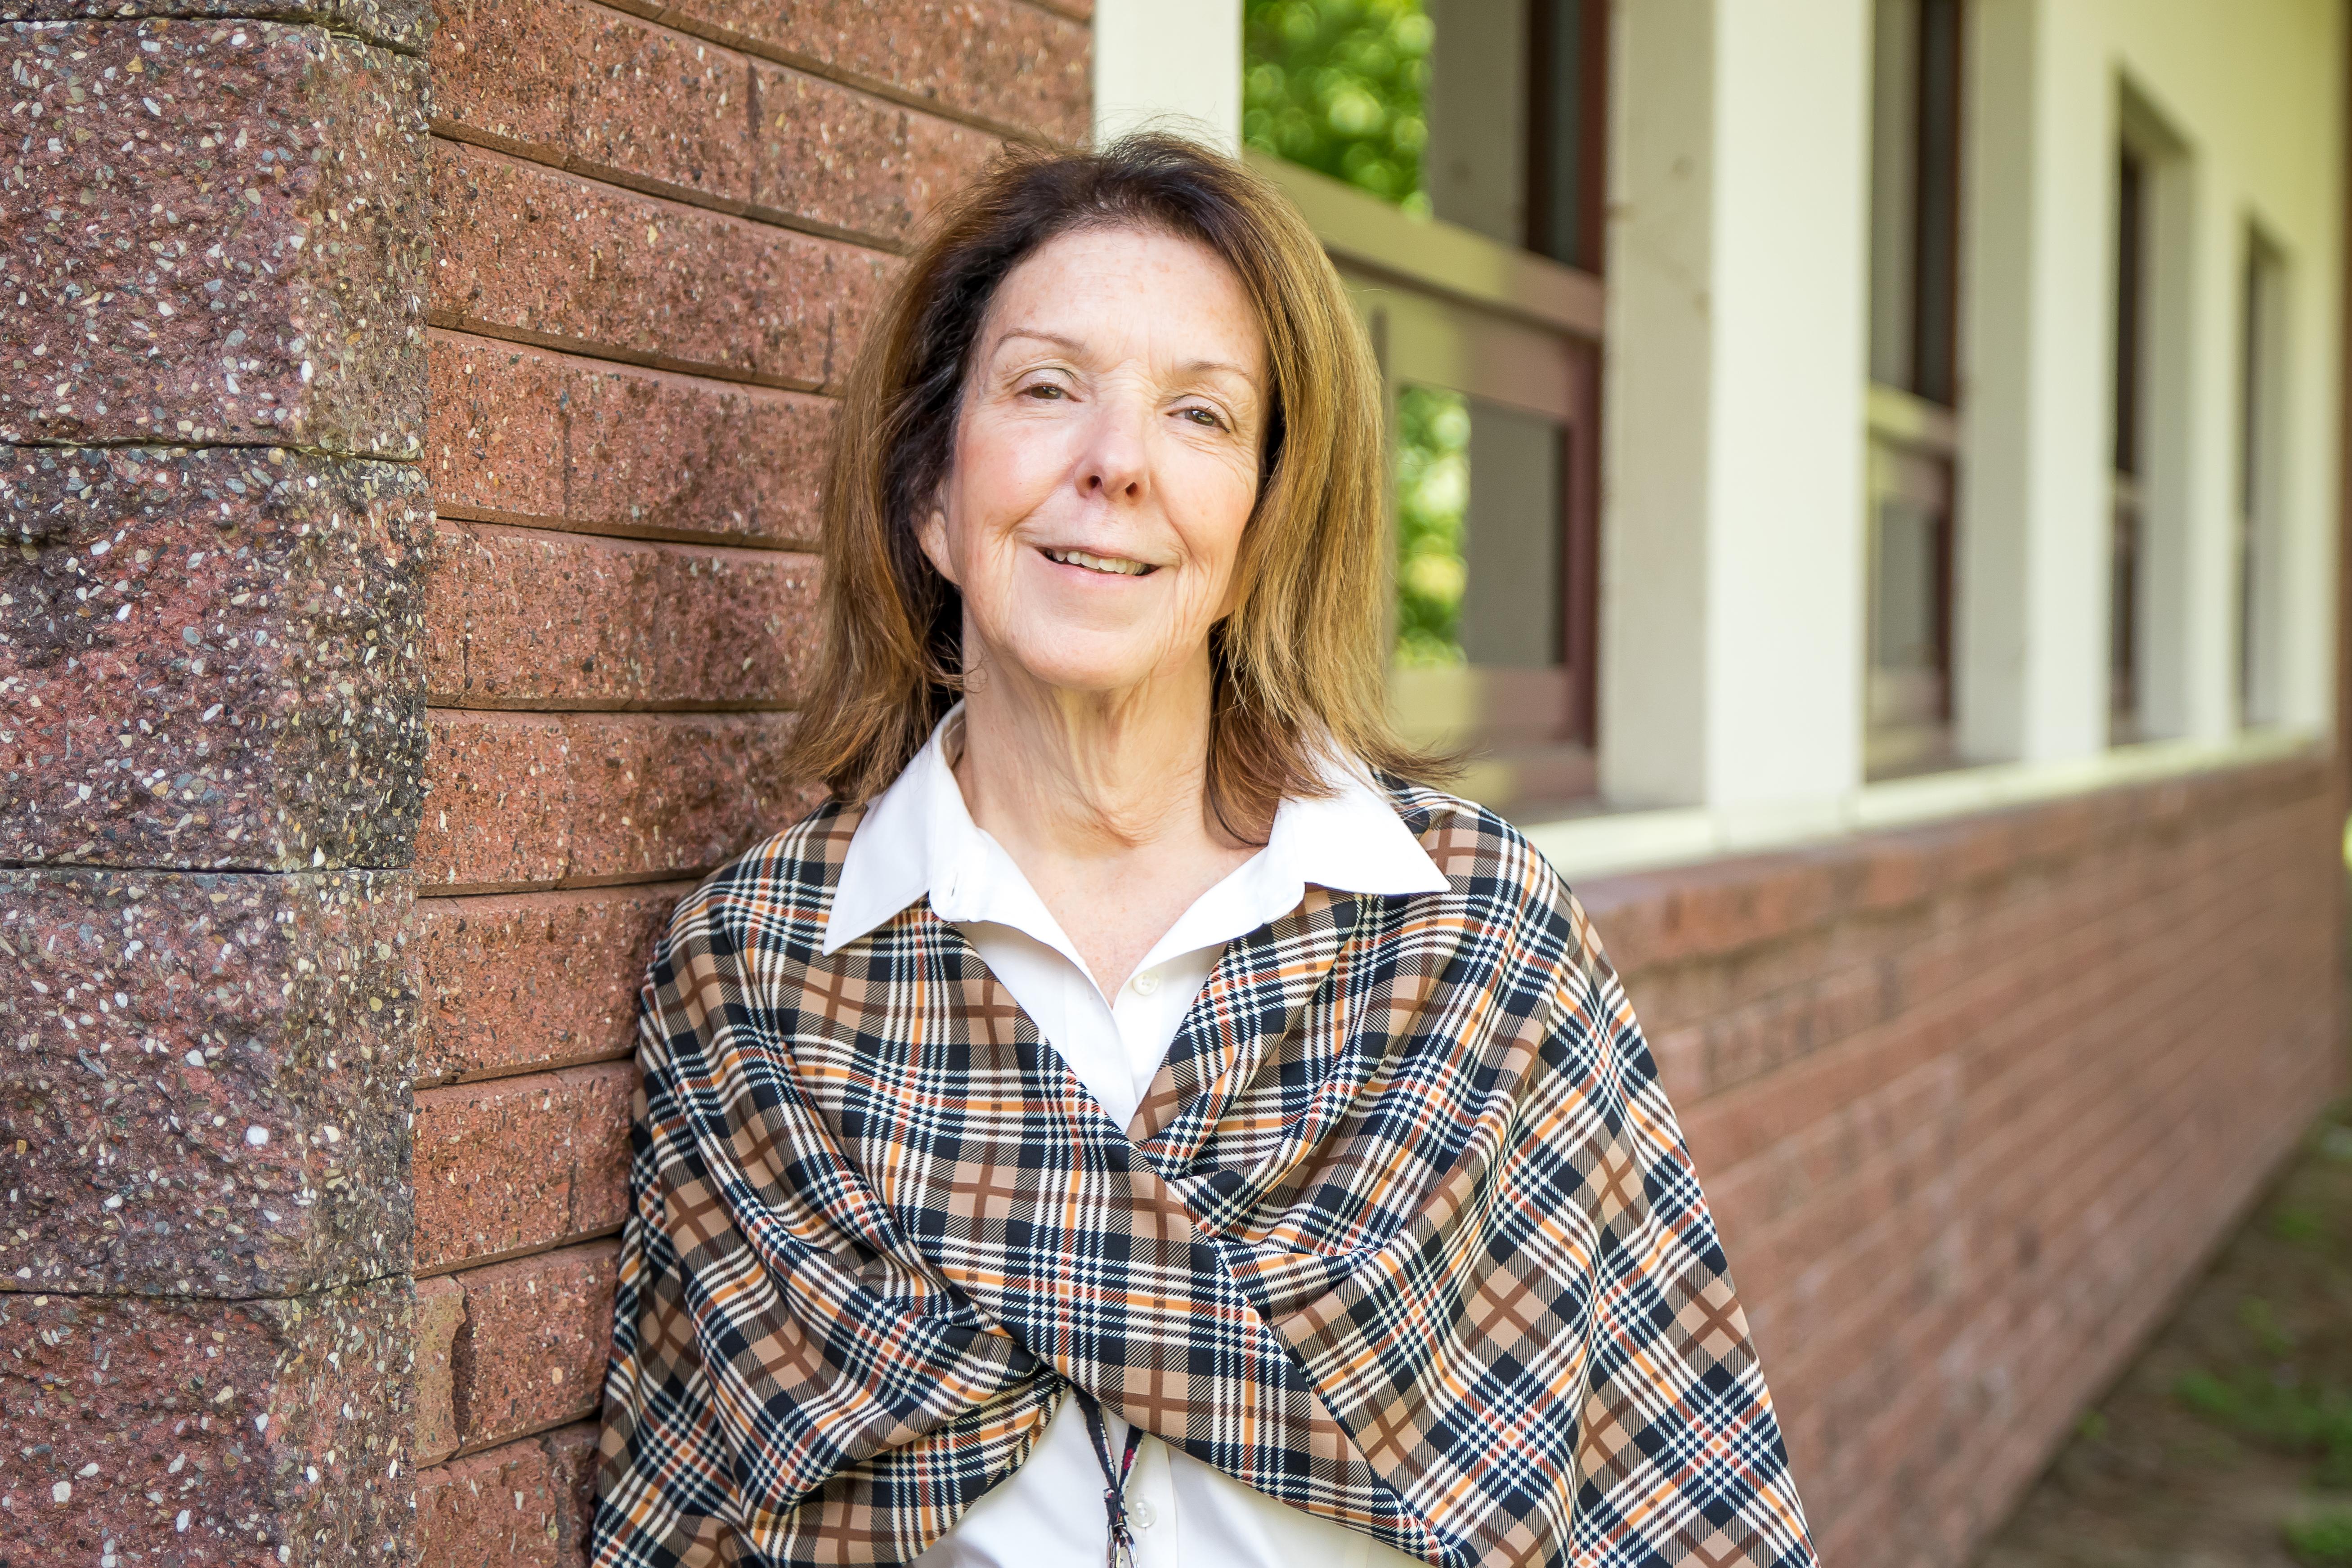 Gwen Eshler